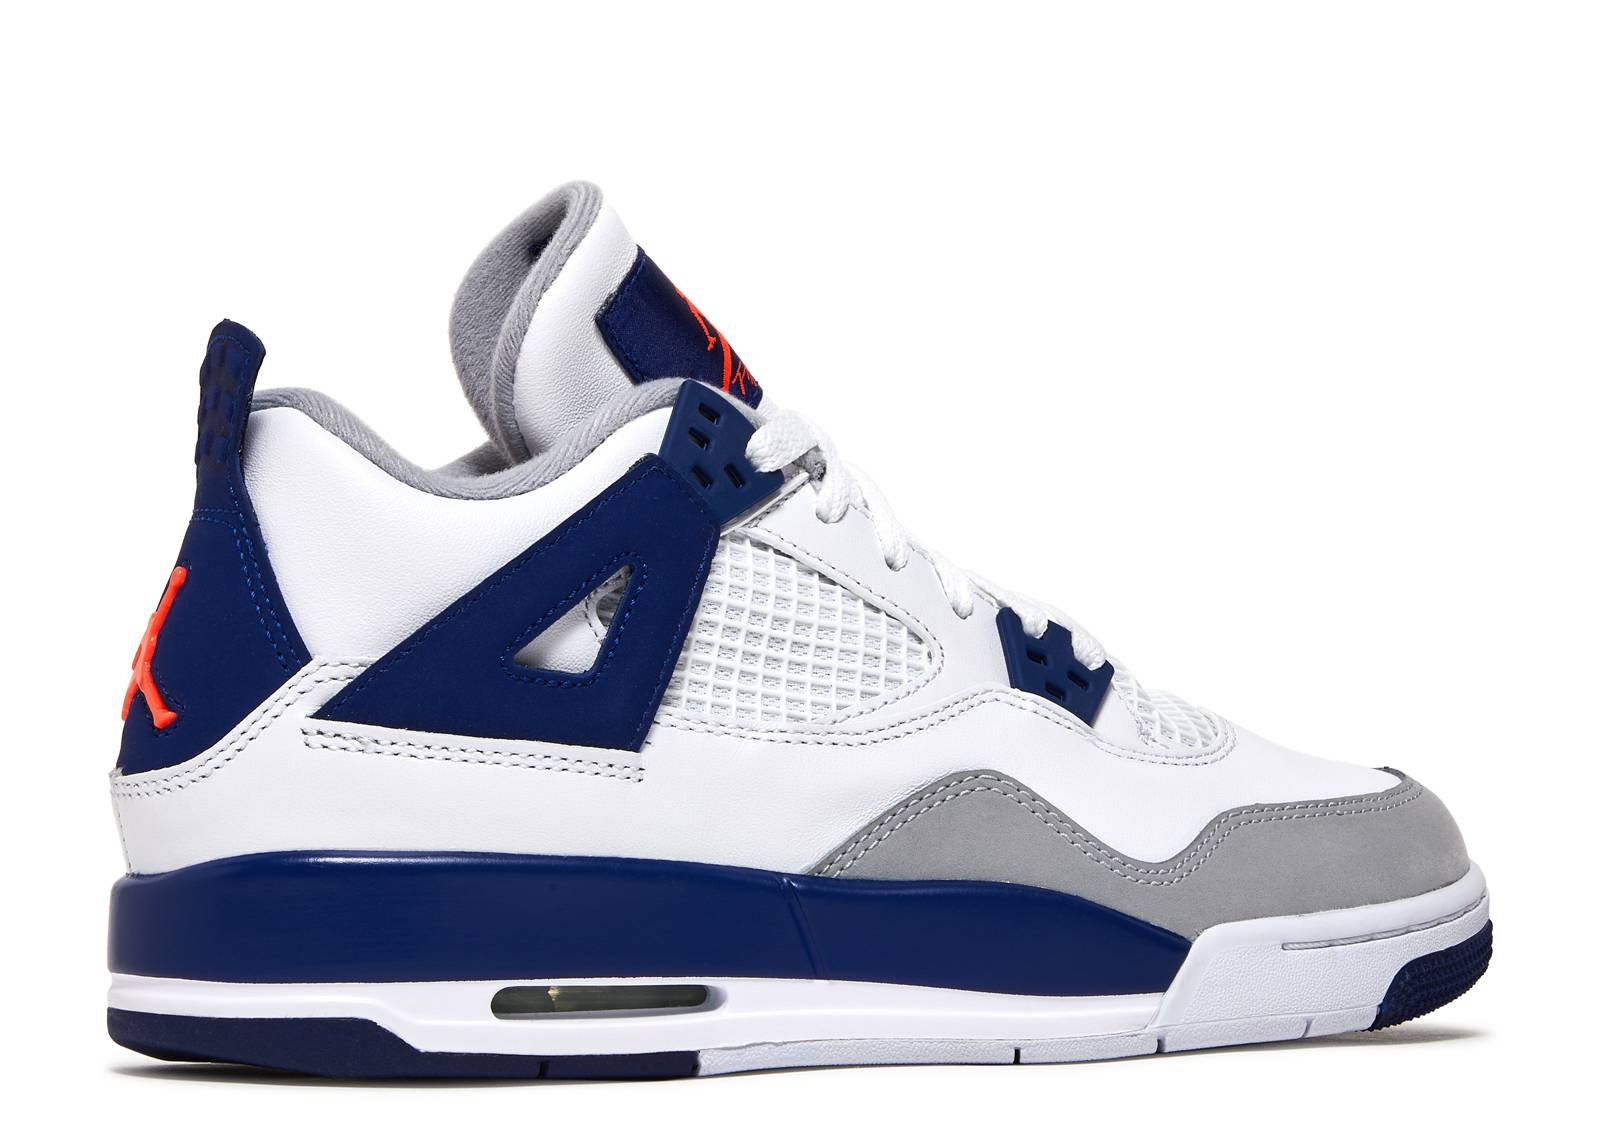 sports shoes 013a7 f6da5 ... Knicks White Deep Royal Blue-Wolf Grey-Hyper Orange For electric  players..  jordans 2014 popular air jordan 4 doernbecher for sale